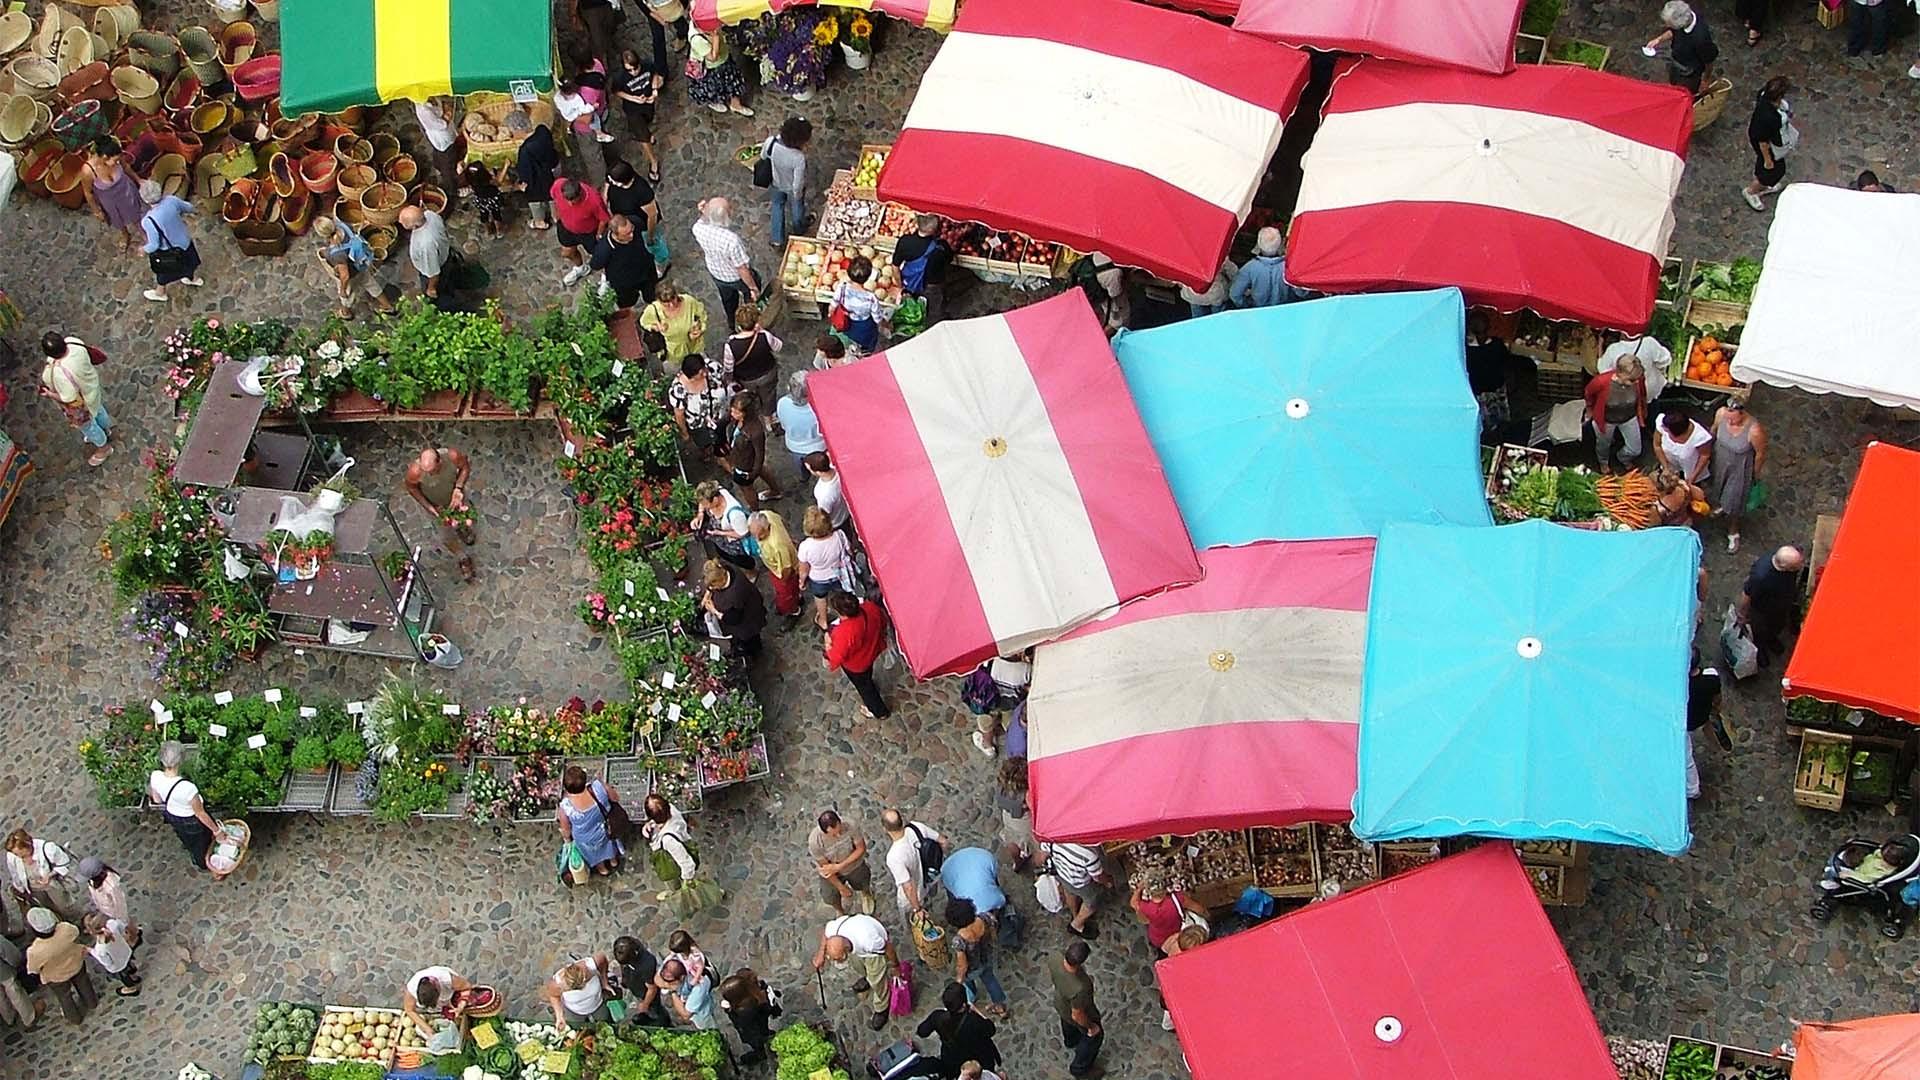 Azalea Dalton – 'Villefranche Market'